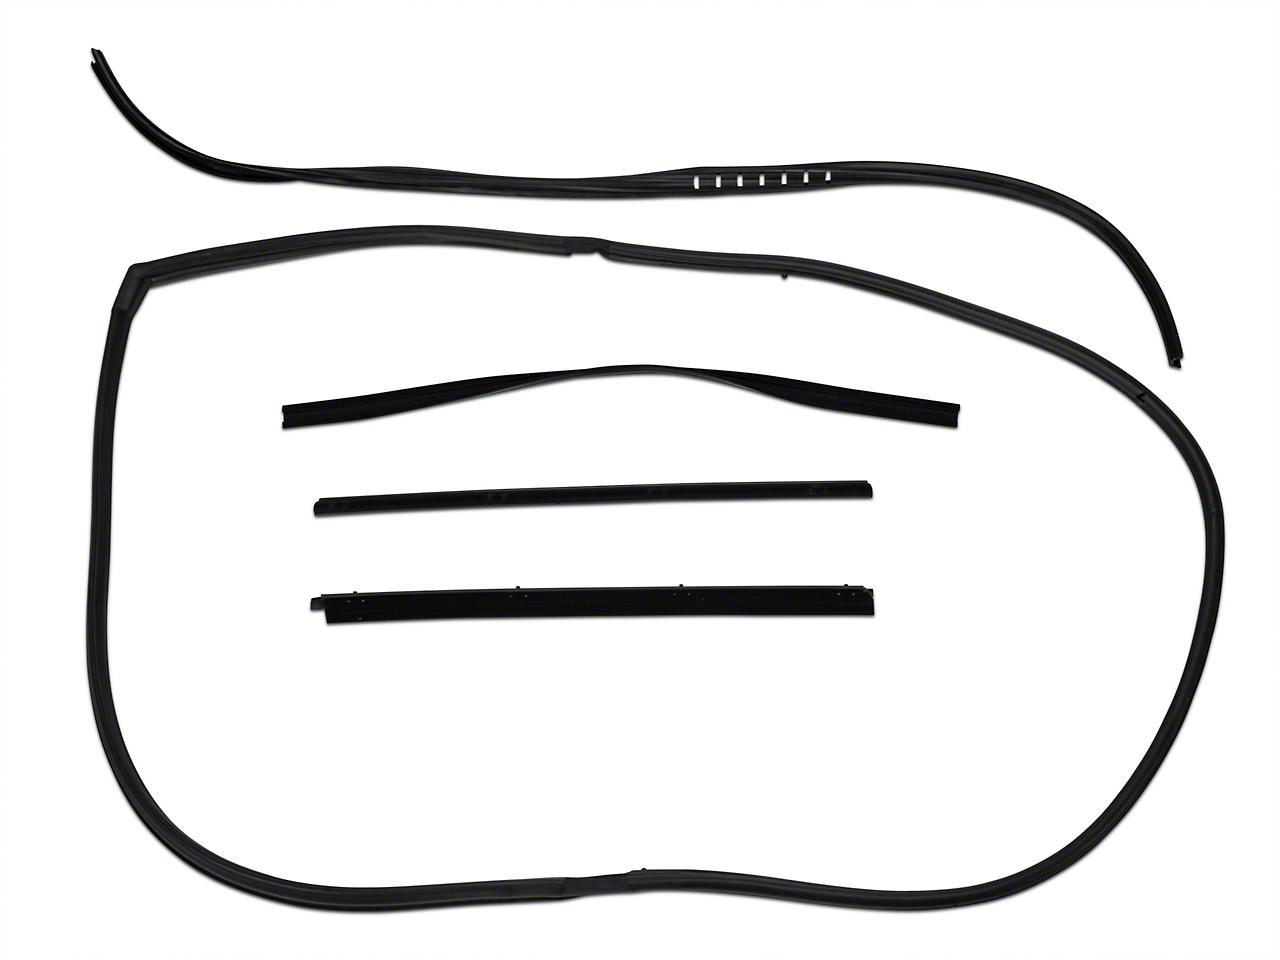 OPR Window Channel Seal Kit Driver Side w/ Movable Vent (87-95 Wrangler YJ)